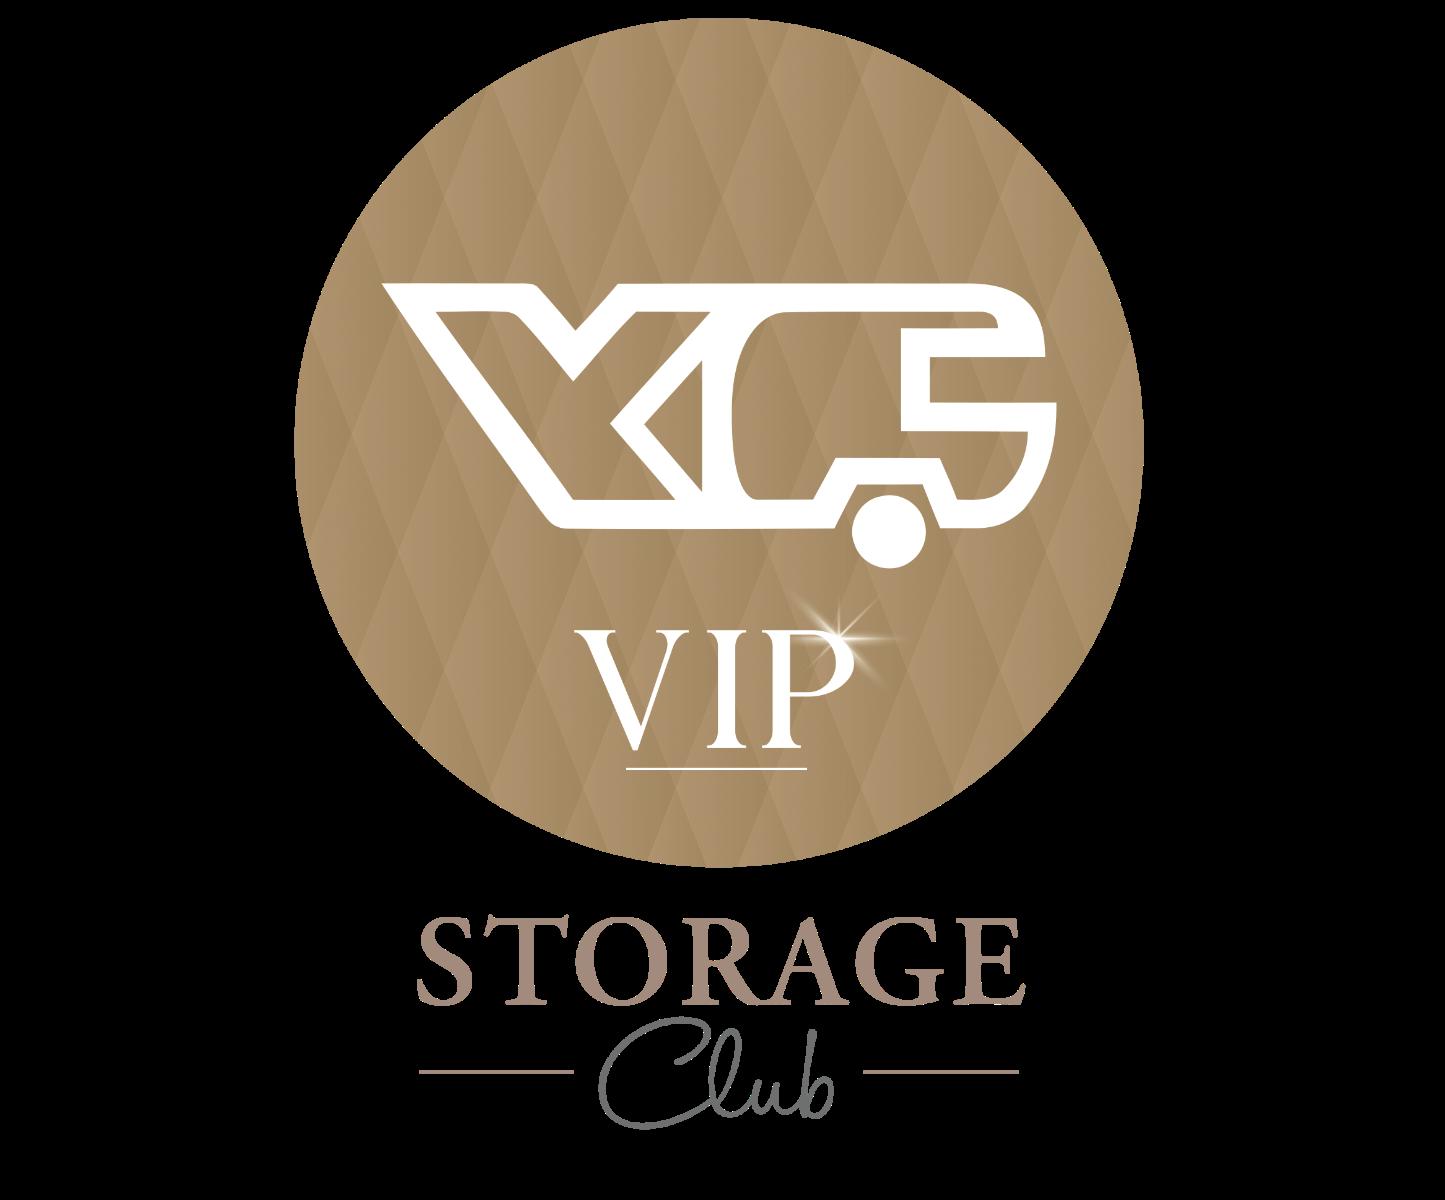 VIP Storage Club